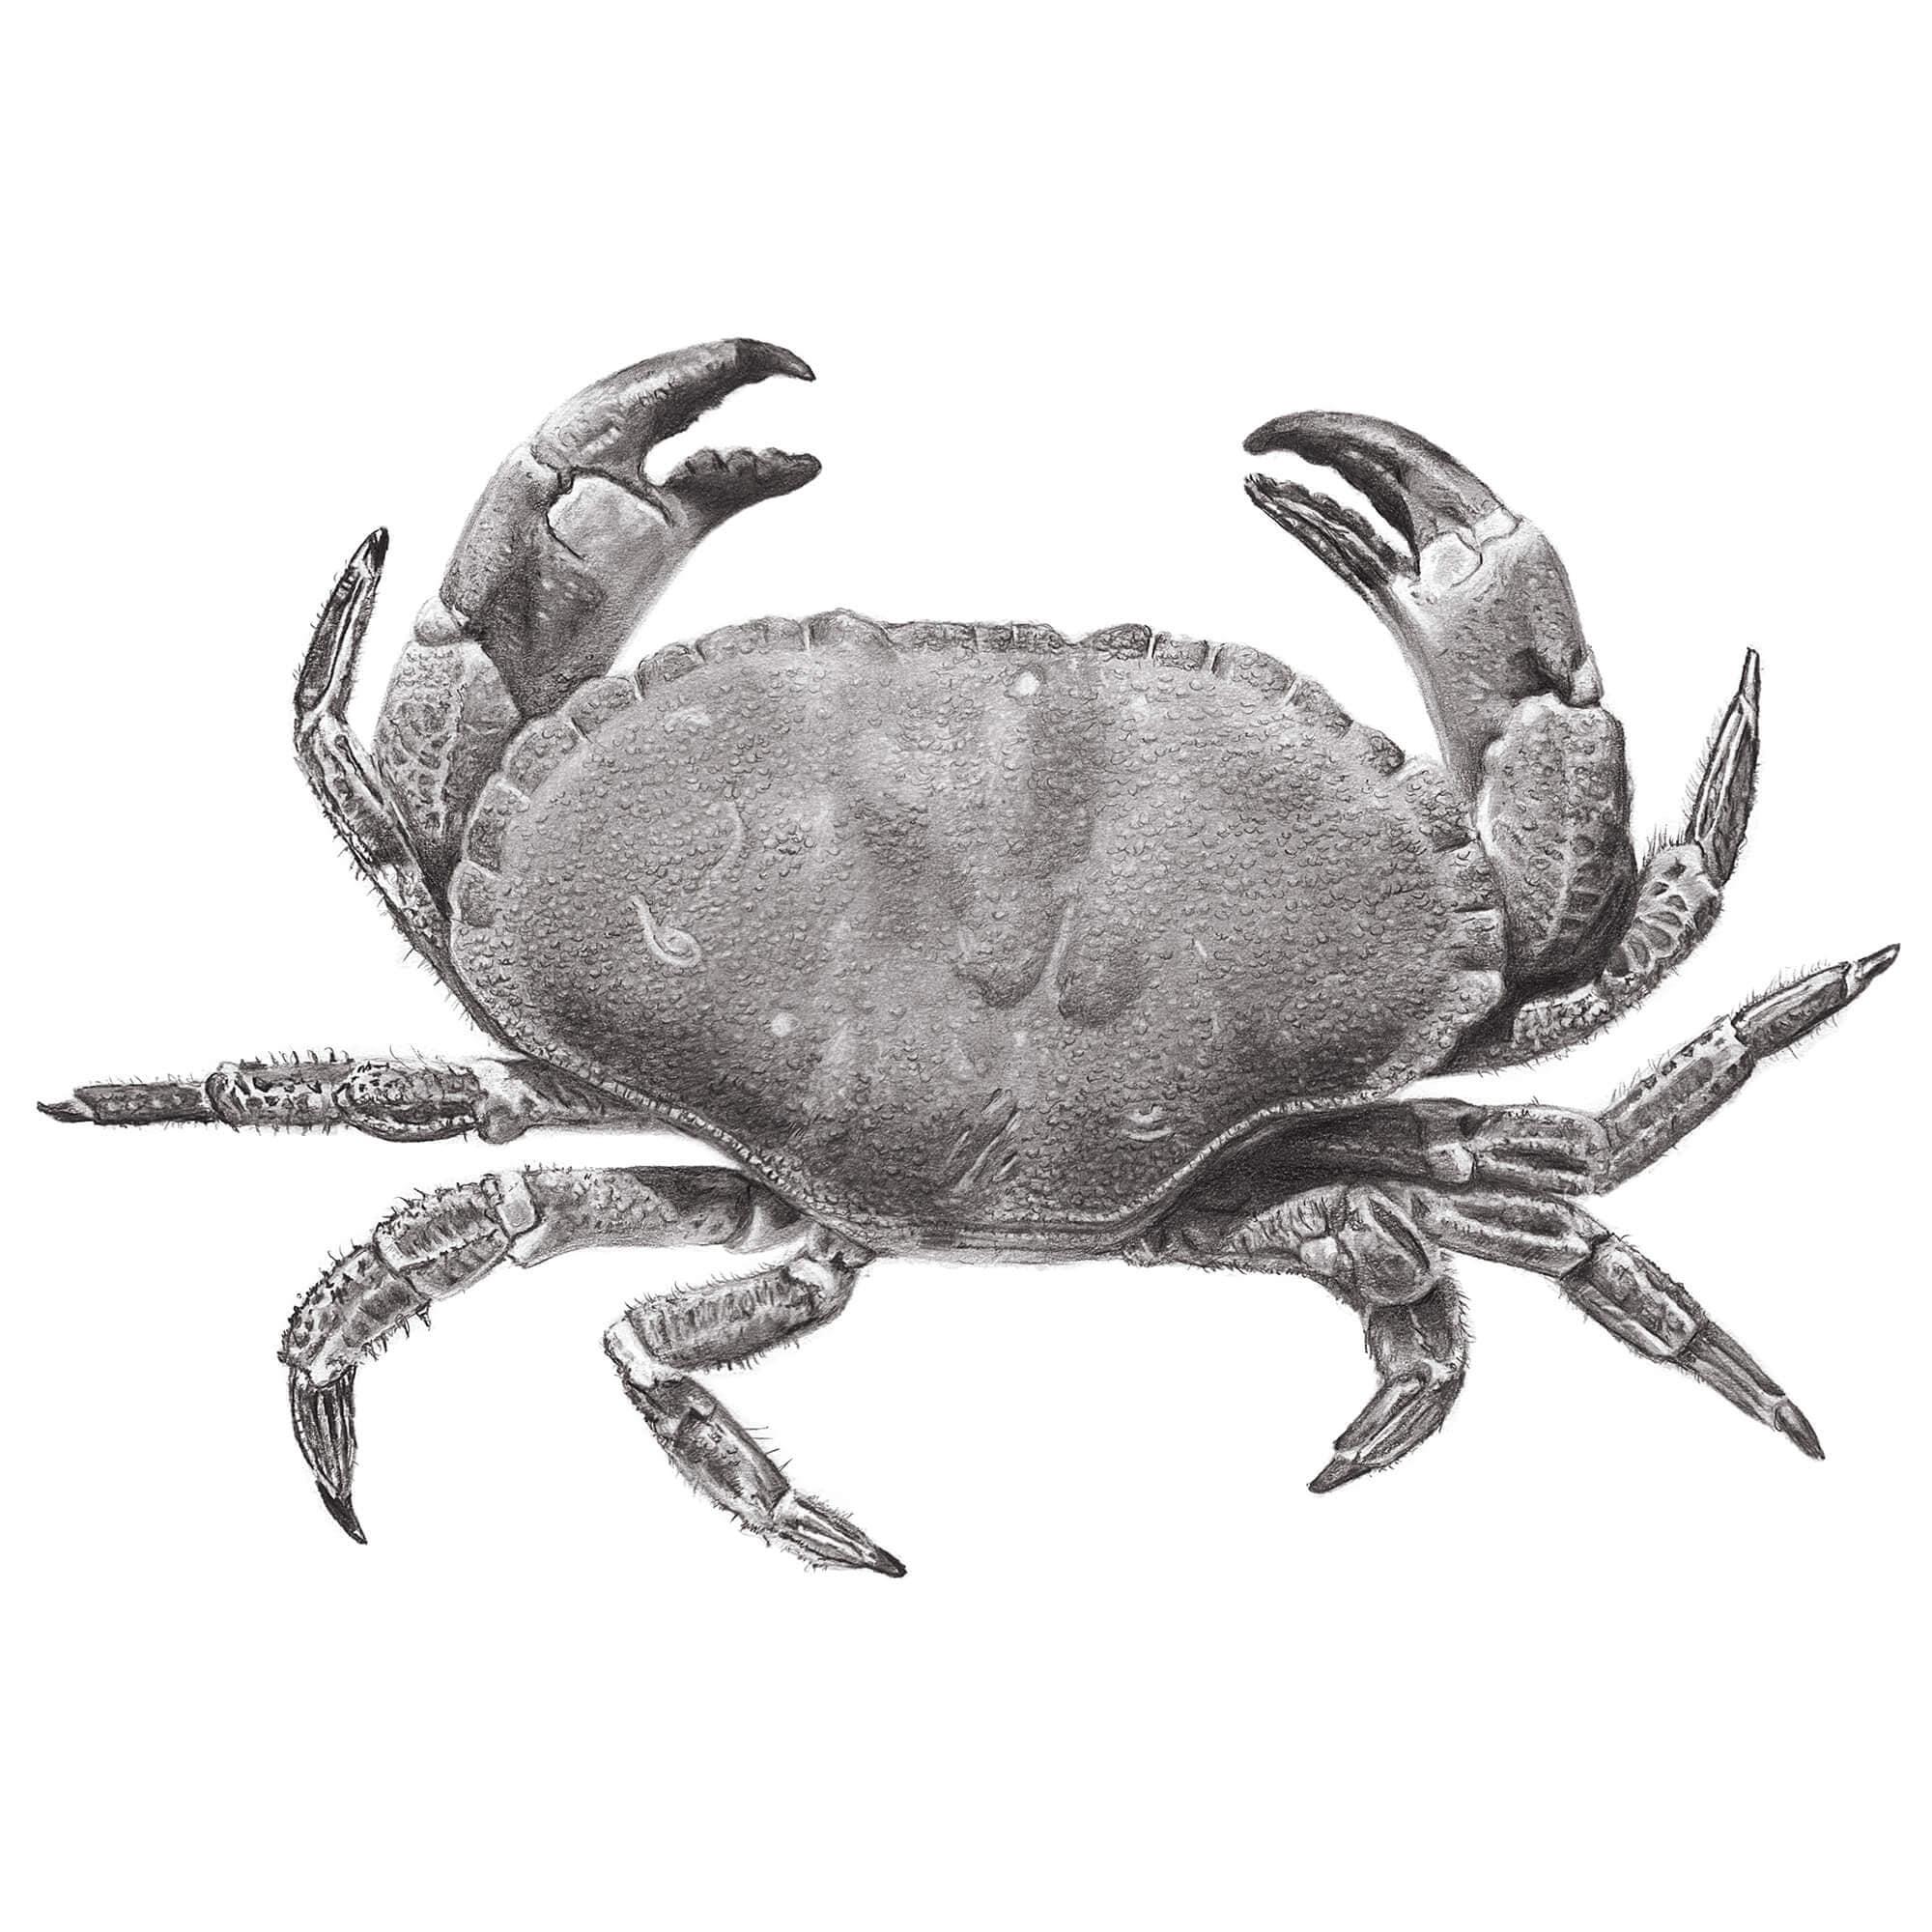 Edible crab glicée print of graphite pencil drawing